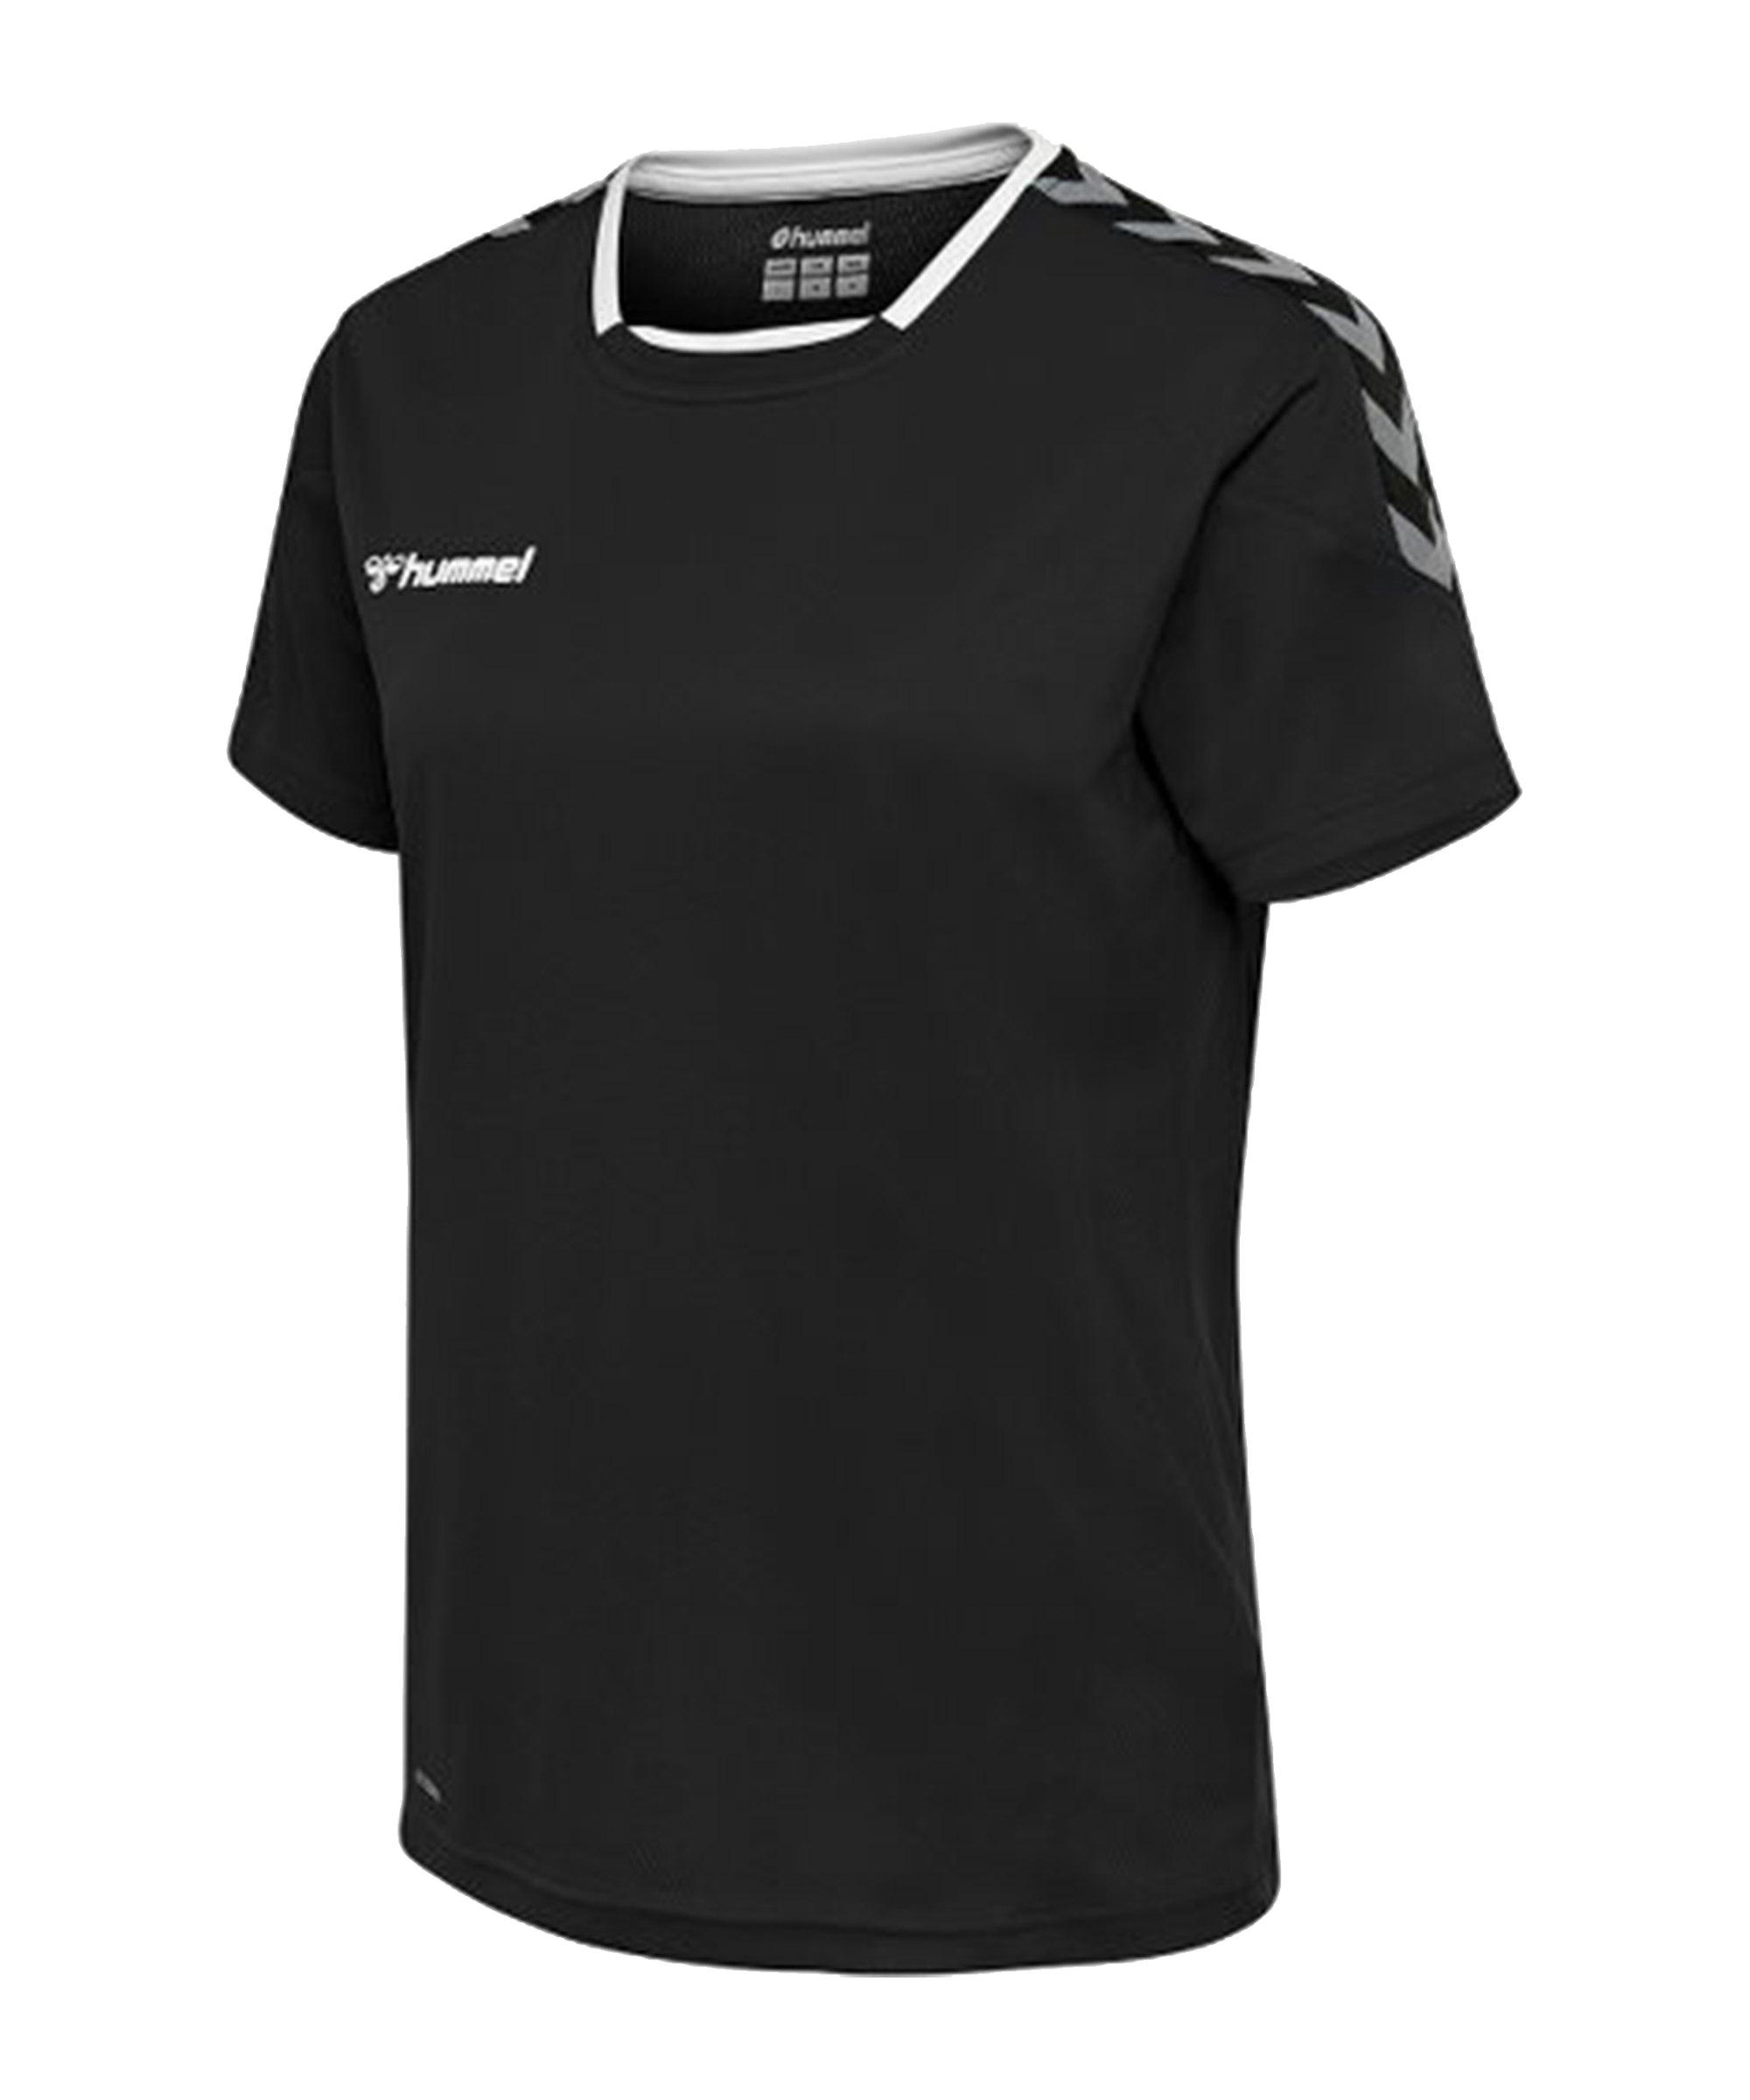 Hummel Authentic Poly Jersey Trikot Damen F2114 - schwarz